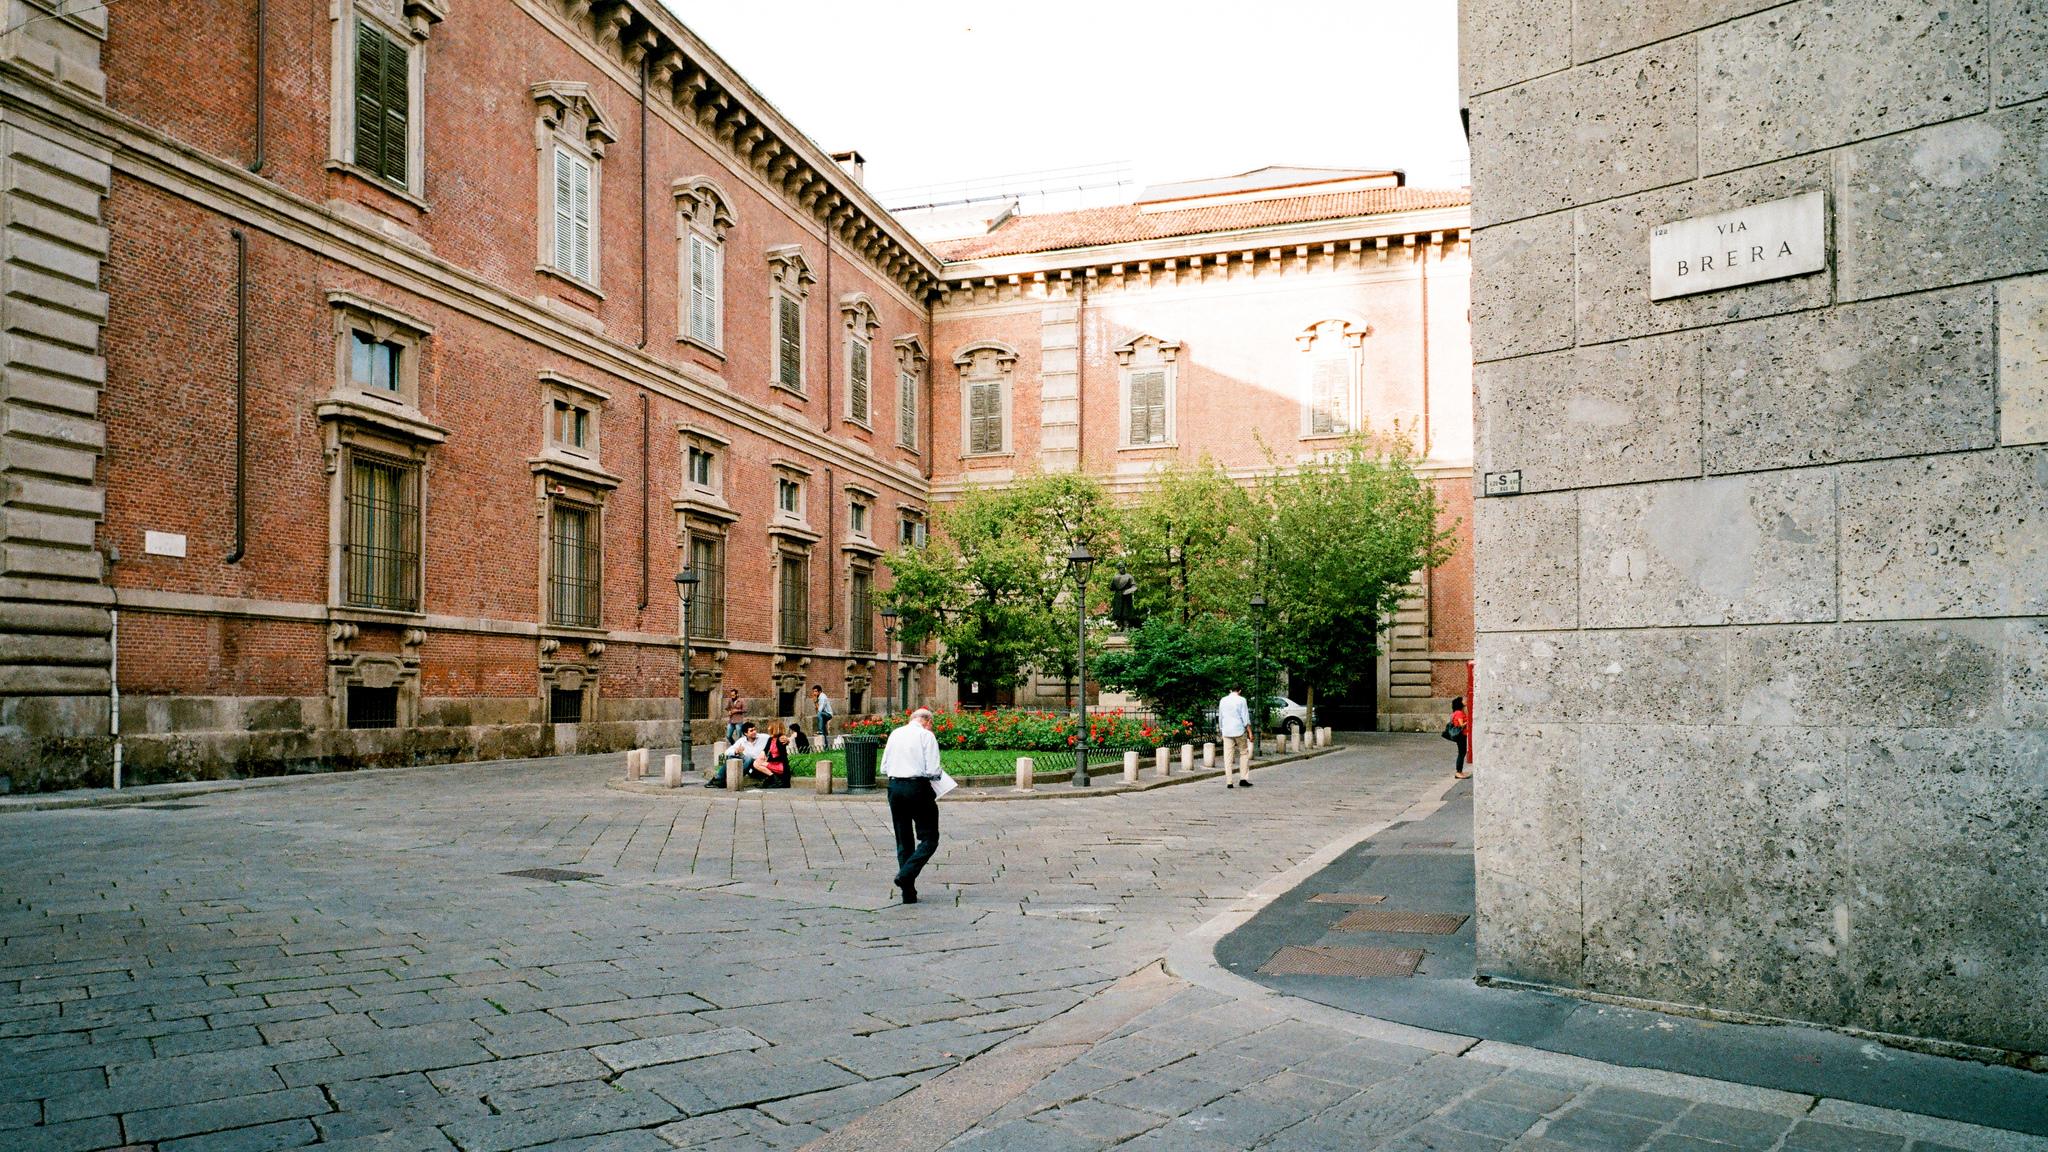 Улица Брера (Миланский Монмартр)